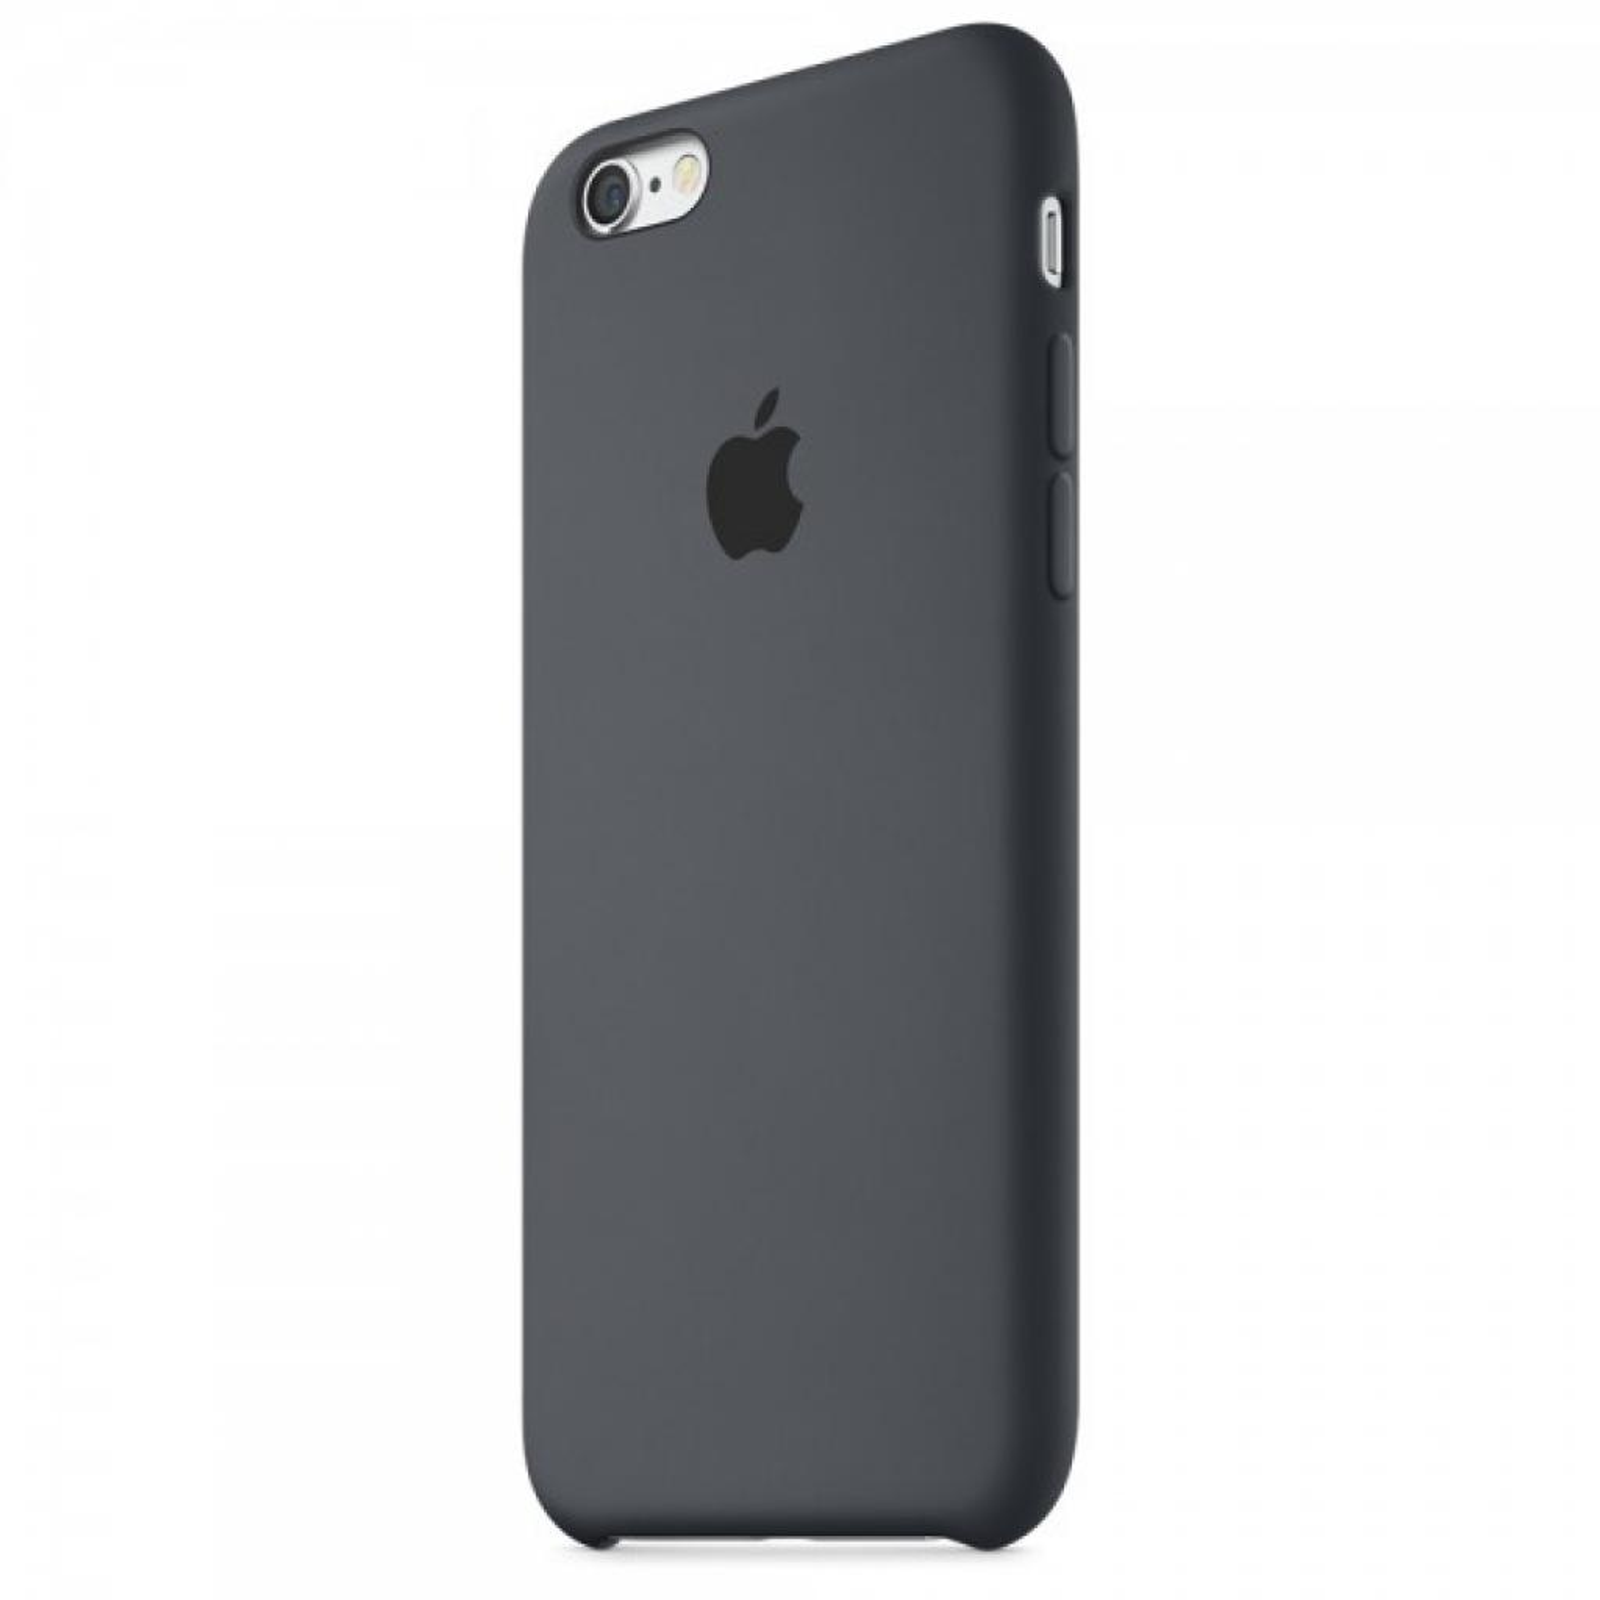 Чехол для моб. телефона Apple для iPhone 6/6s Charcoal Gray (MKY02ZM/A) изображение 2